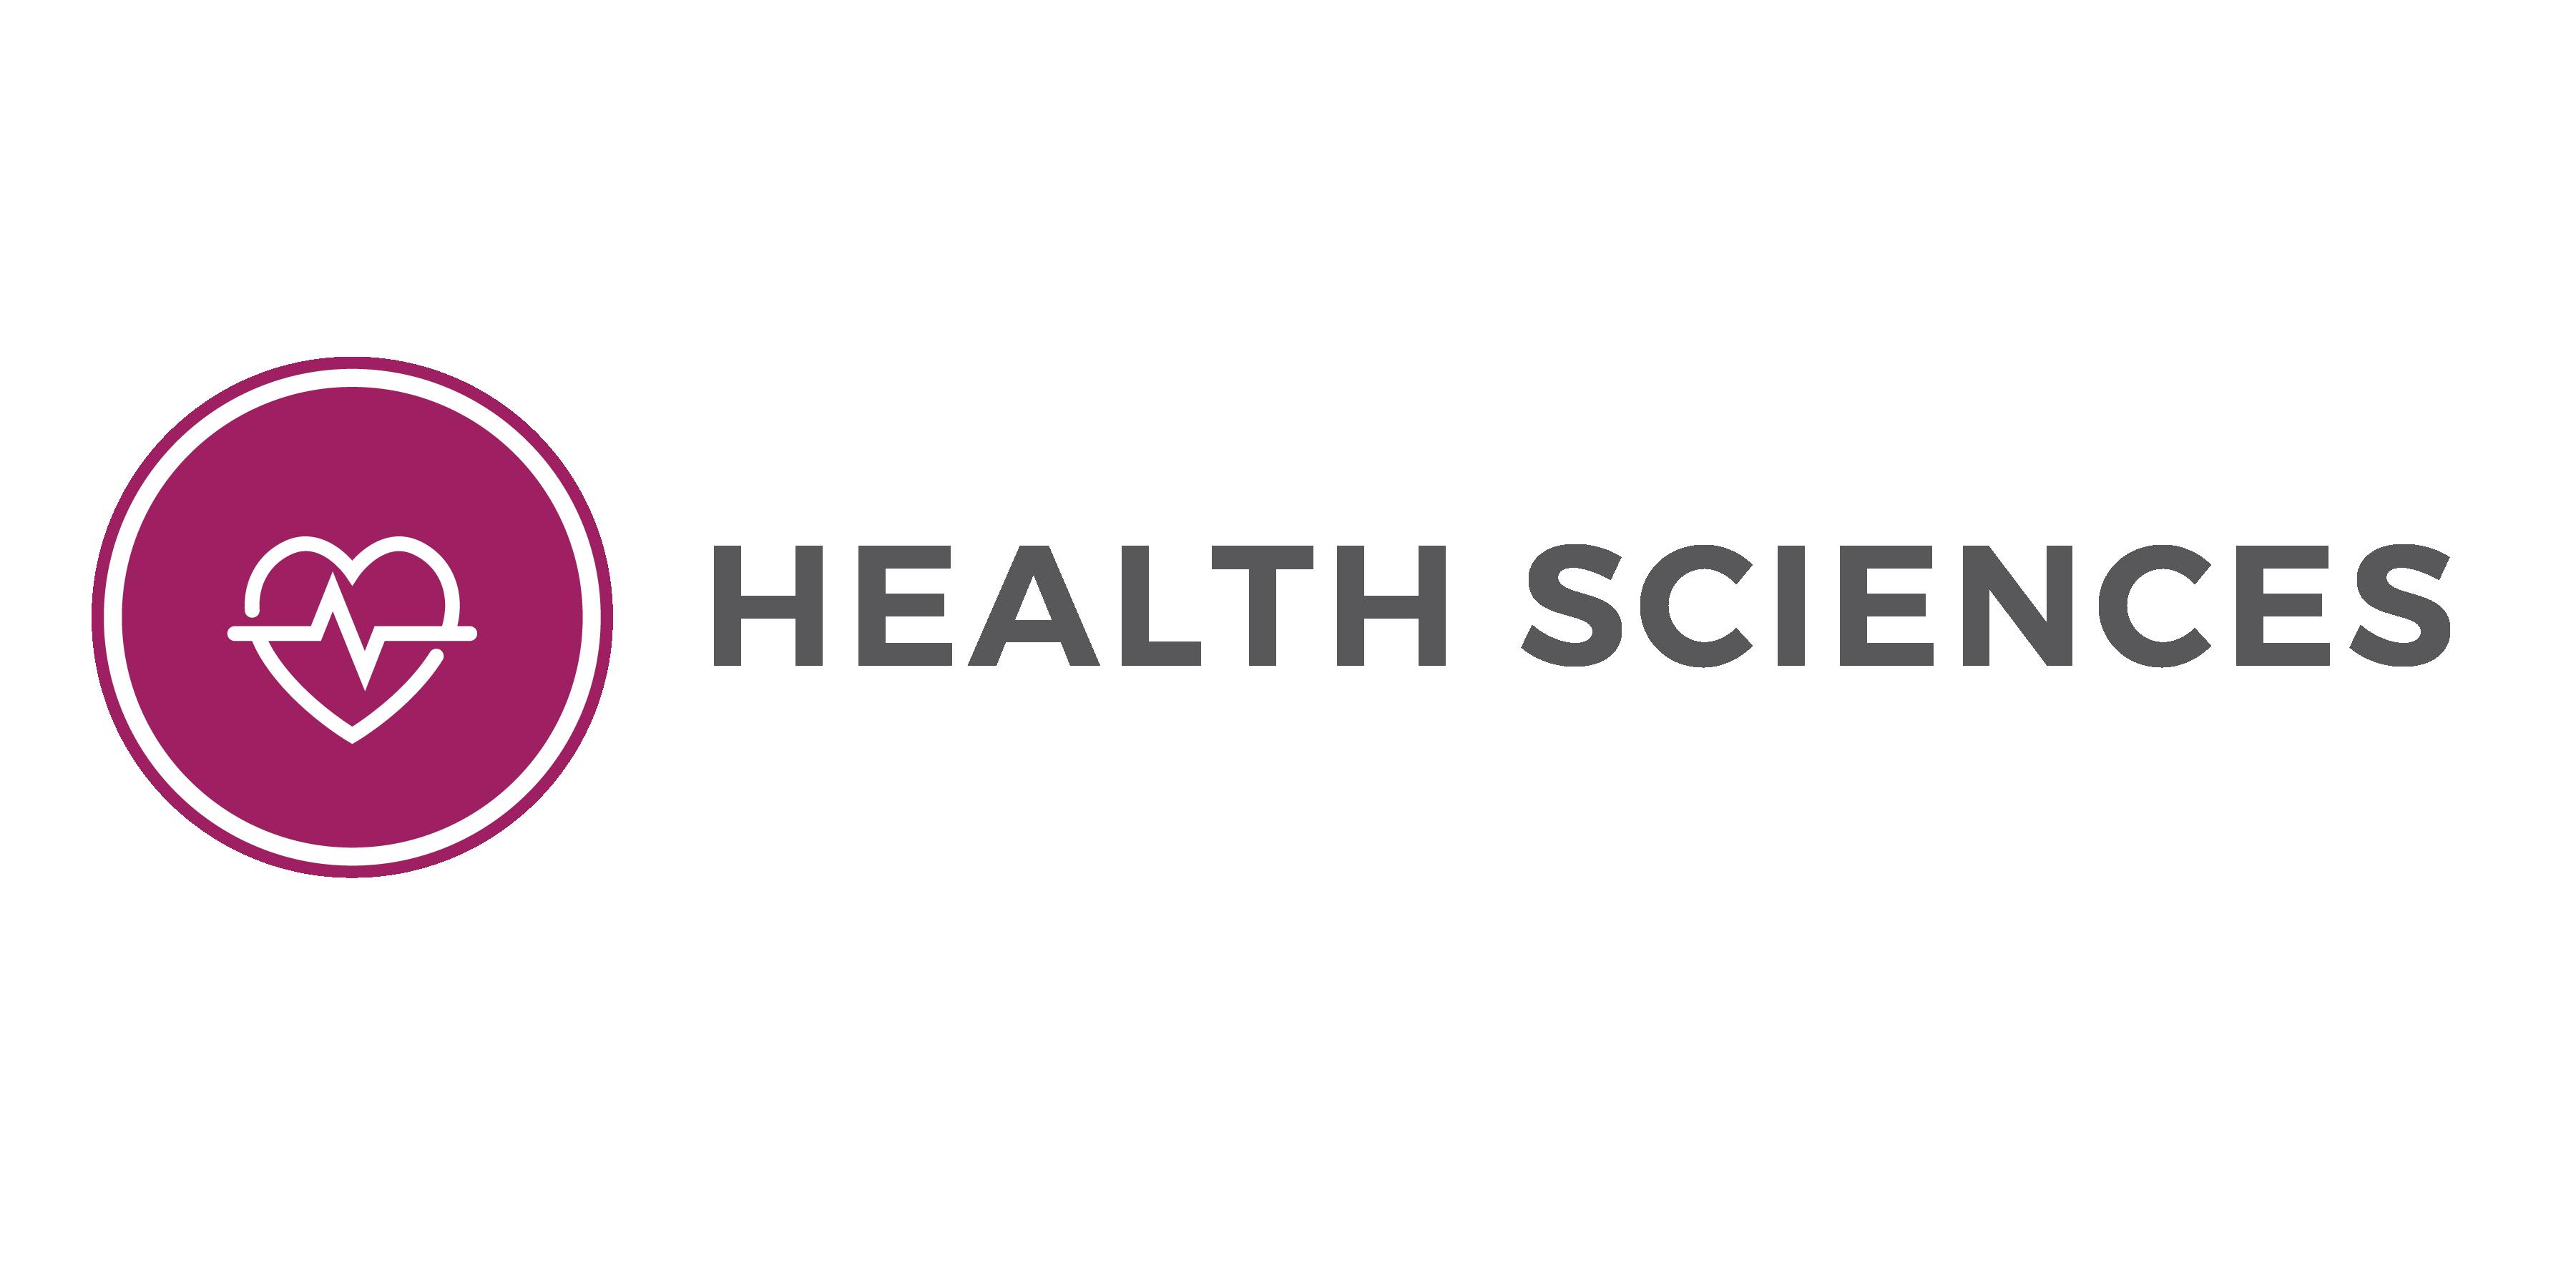 Health Sciences Field of Interest